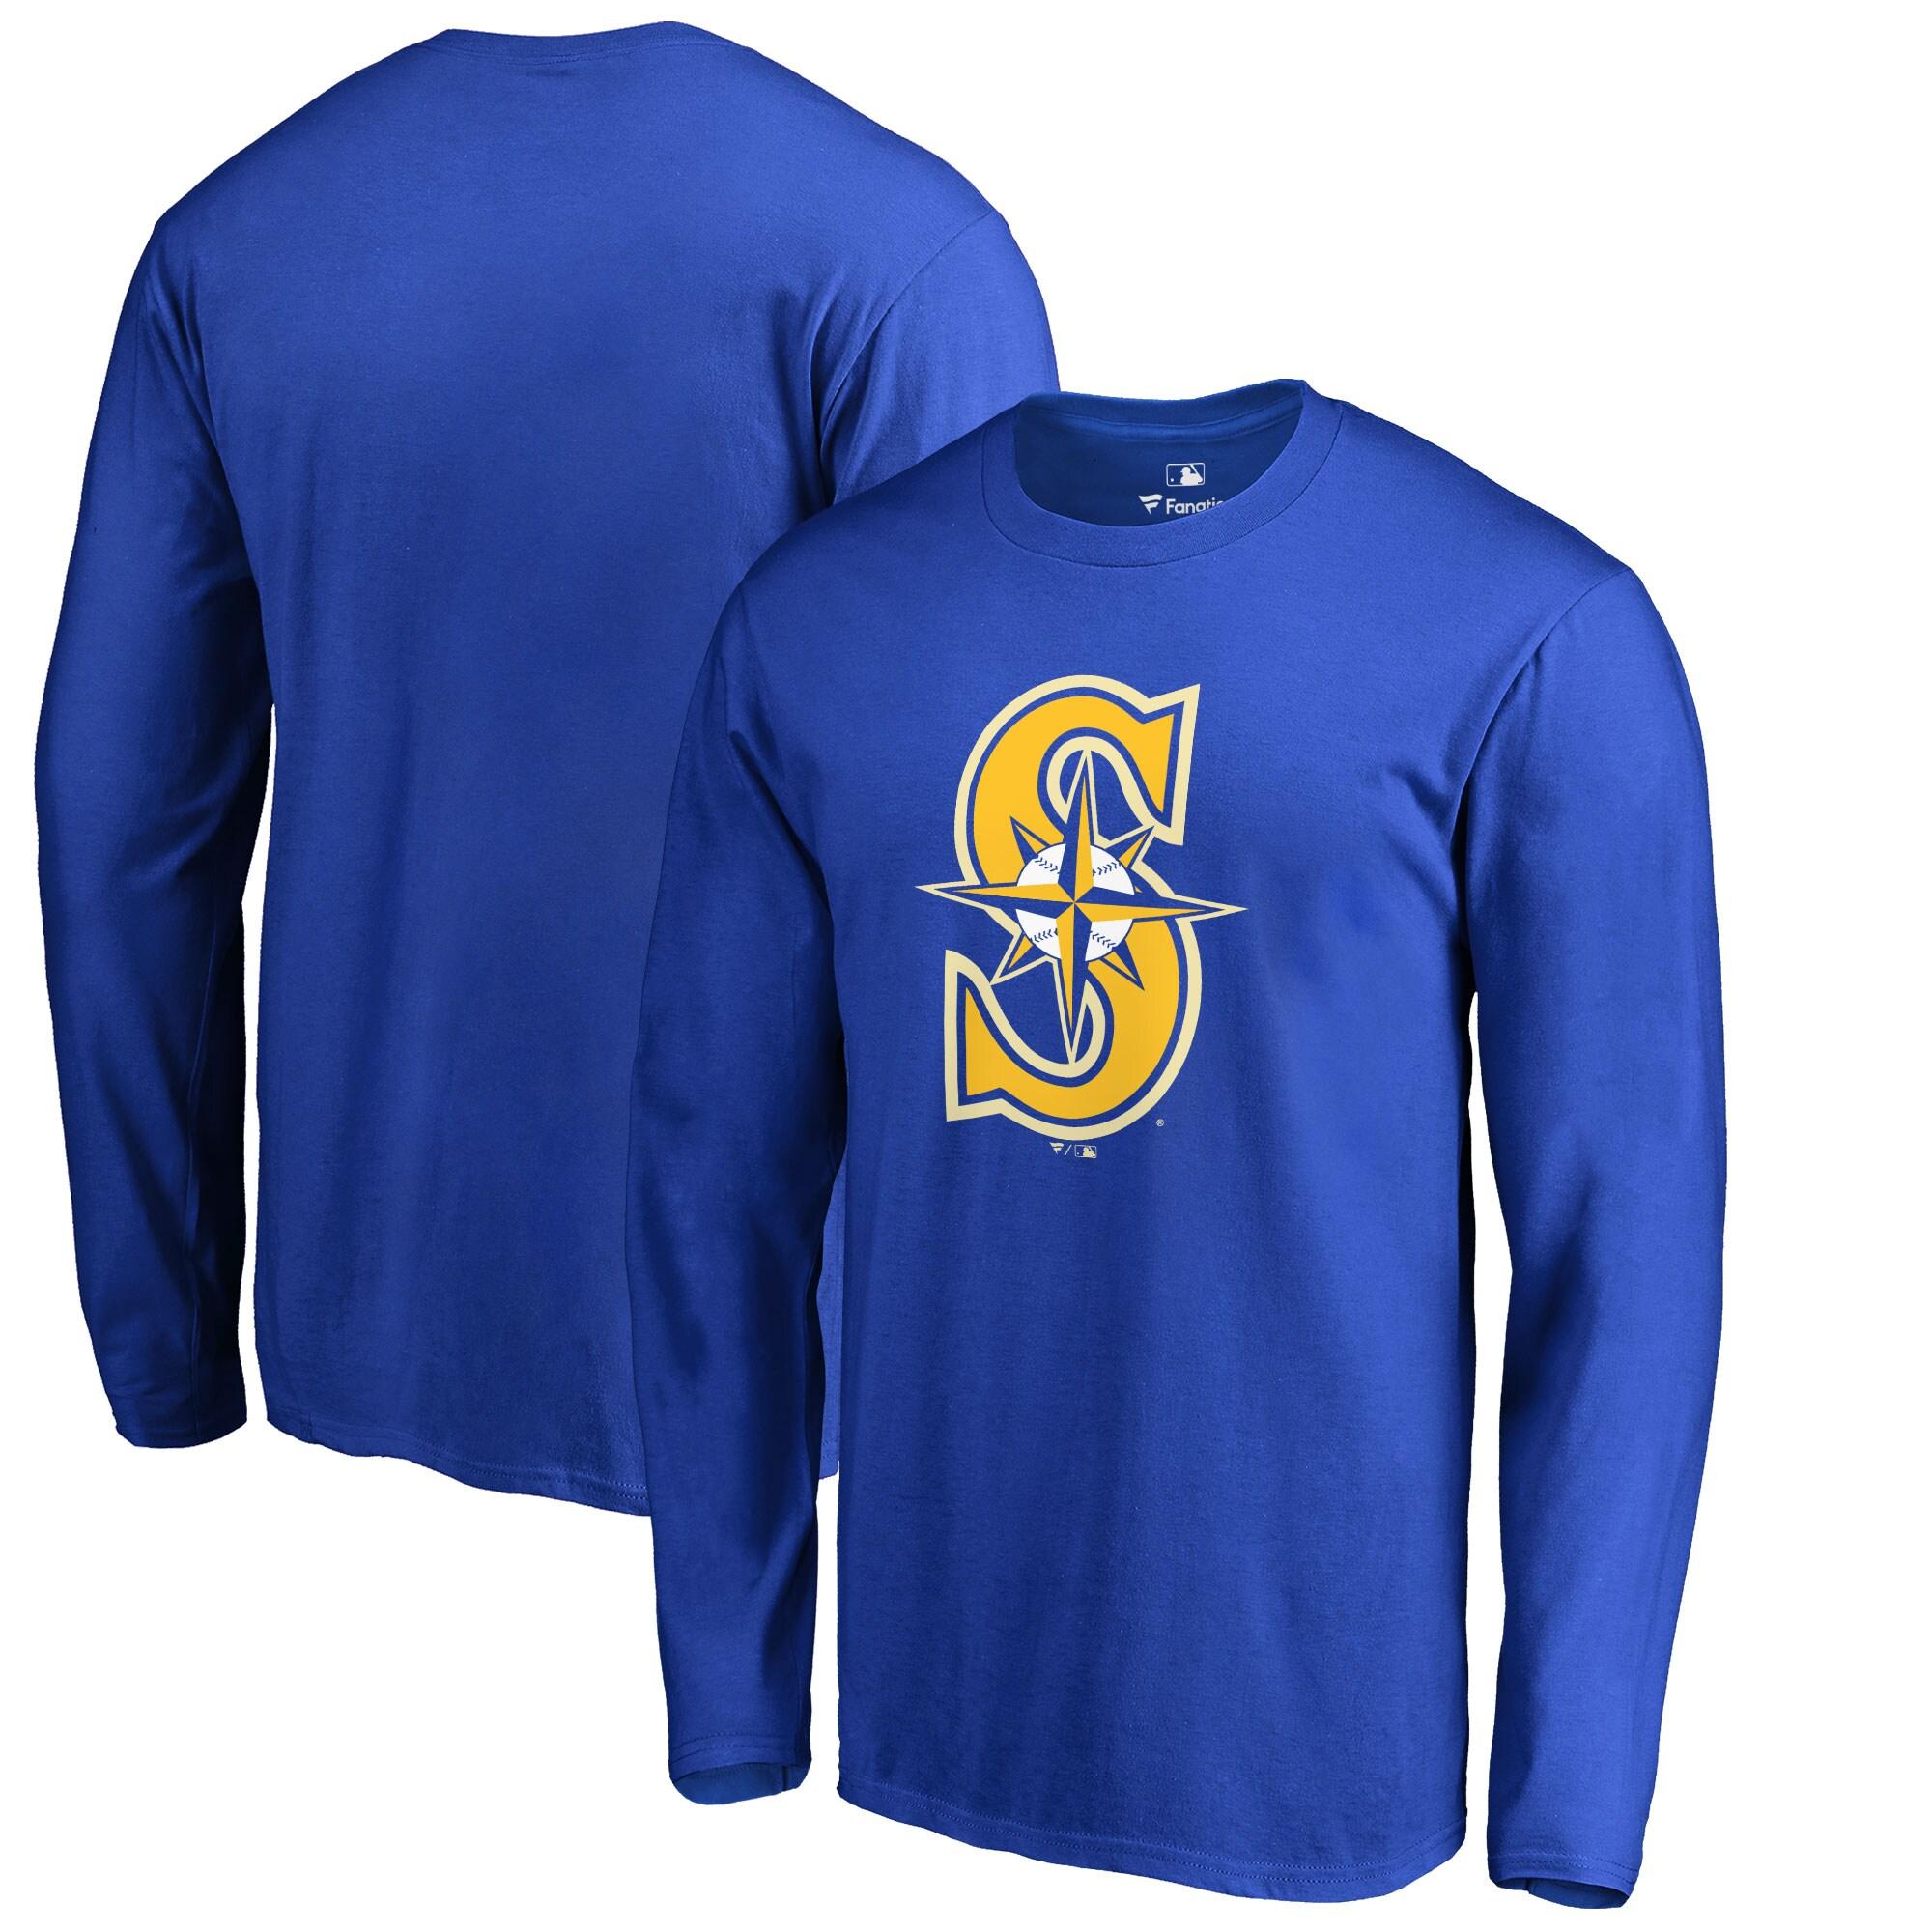 Seattle Mariners Big & Tall Primary Team Logo Long Sleeve T-Shirt - Royal